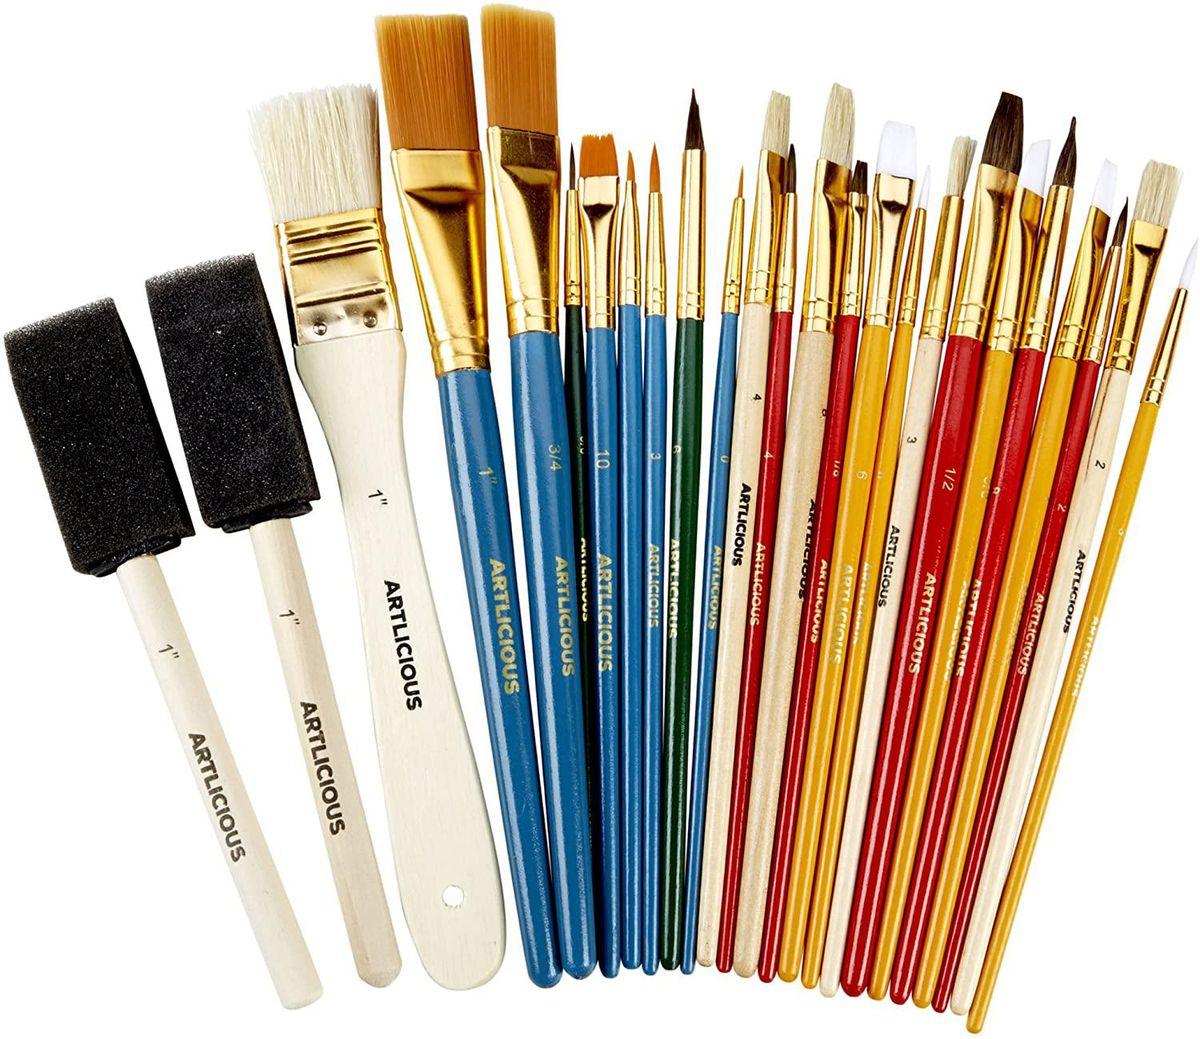 25 All Purpose Oil Paint Brush Value Pack